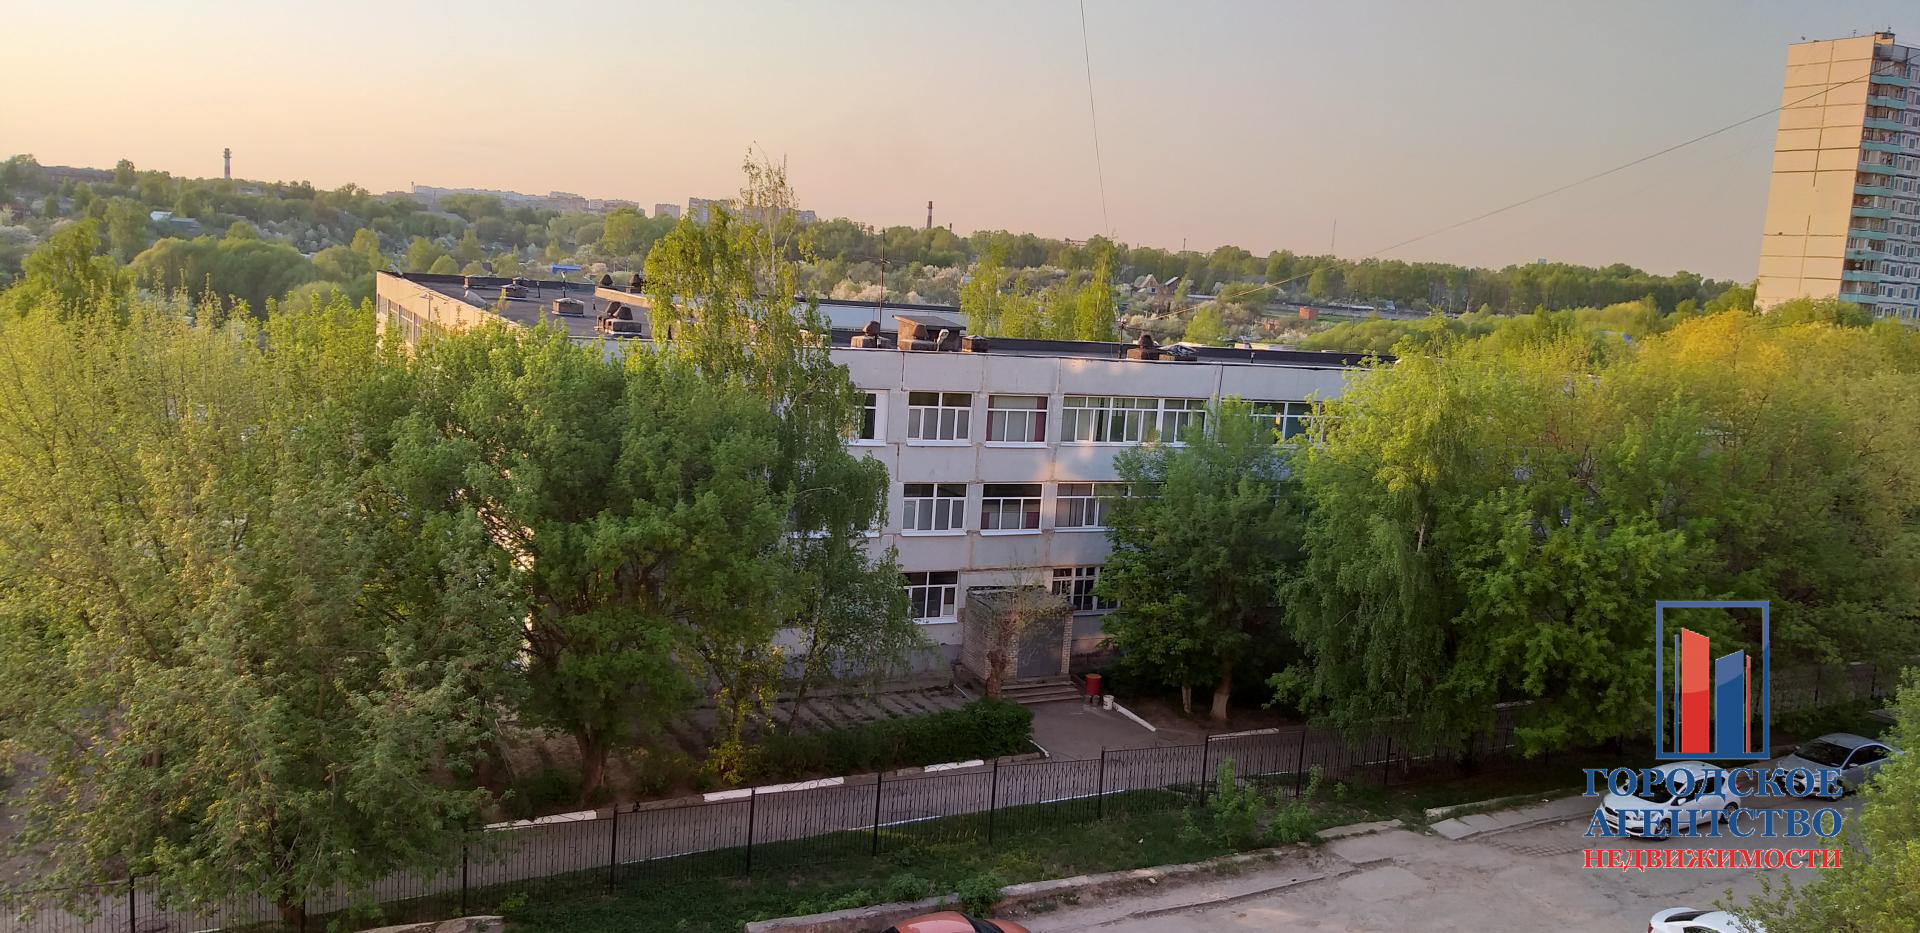 Продается трехкомнатная квартира за 4 000 000 рублей. Московская обл, г Серпухов, ул Луначарского, д 33.